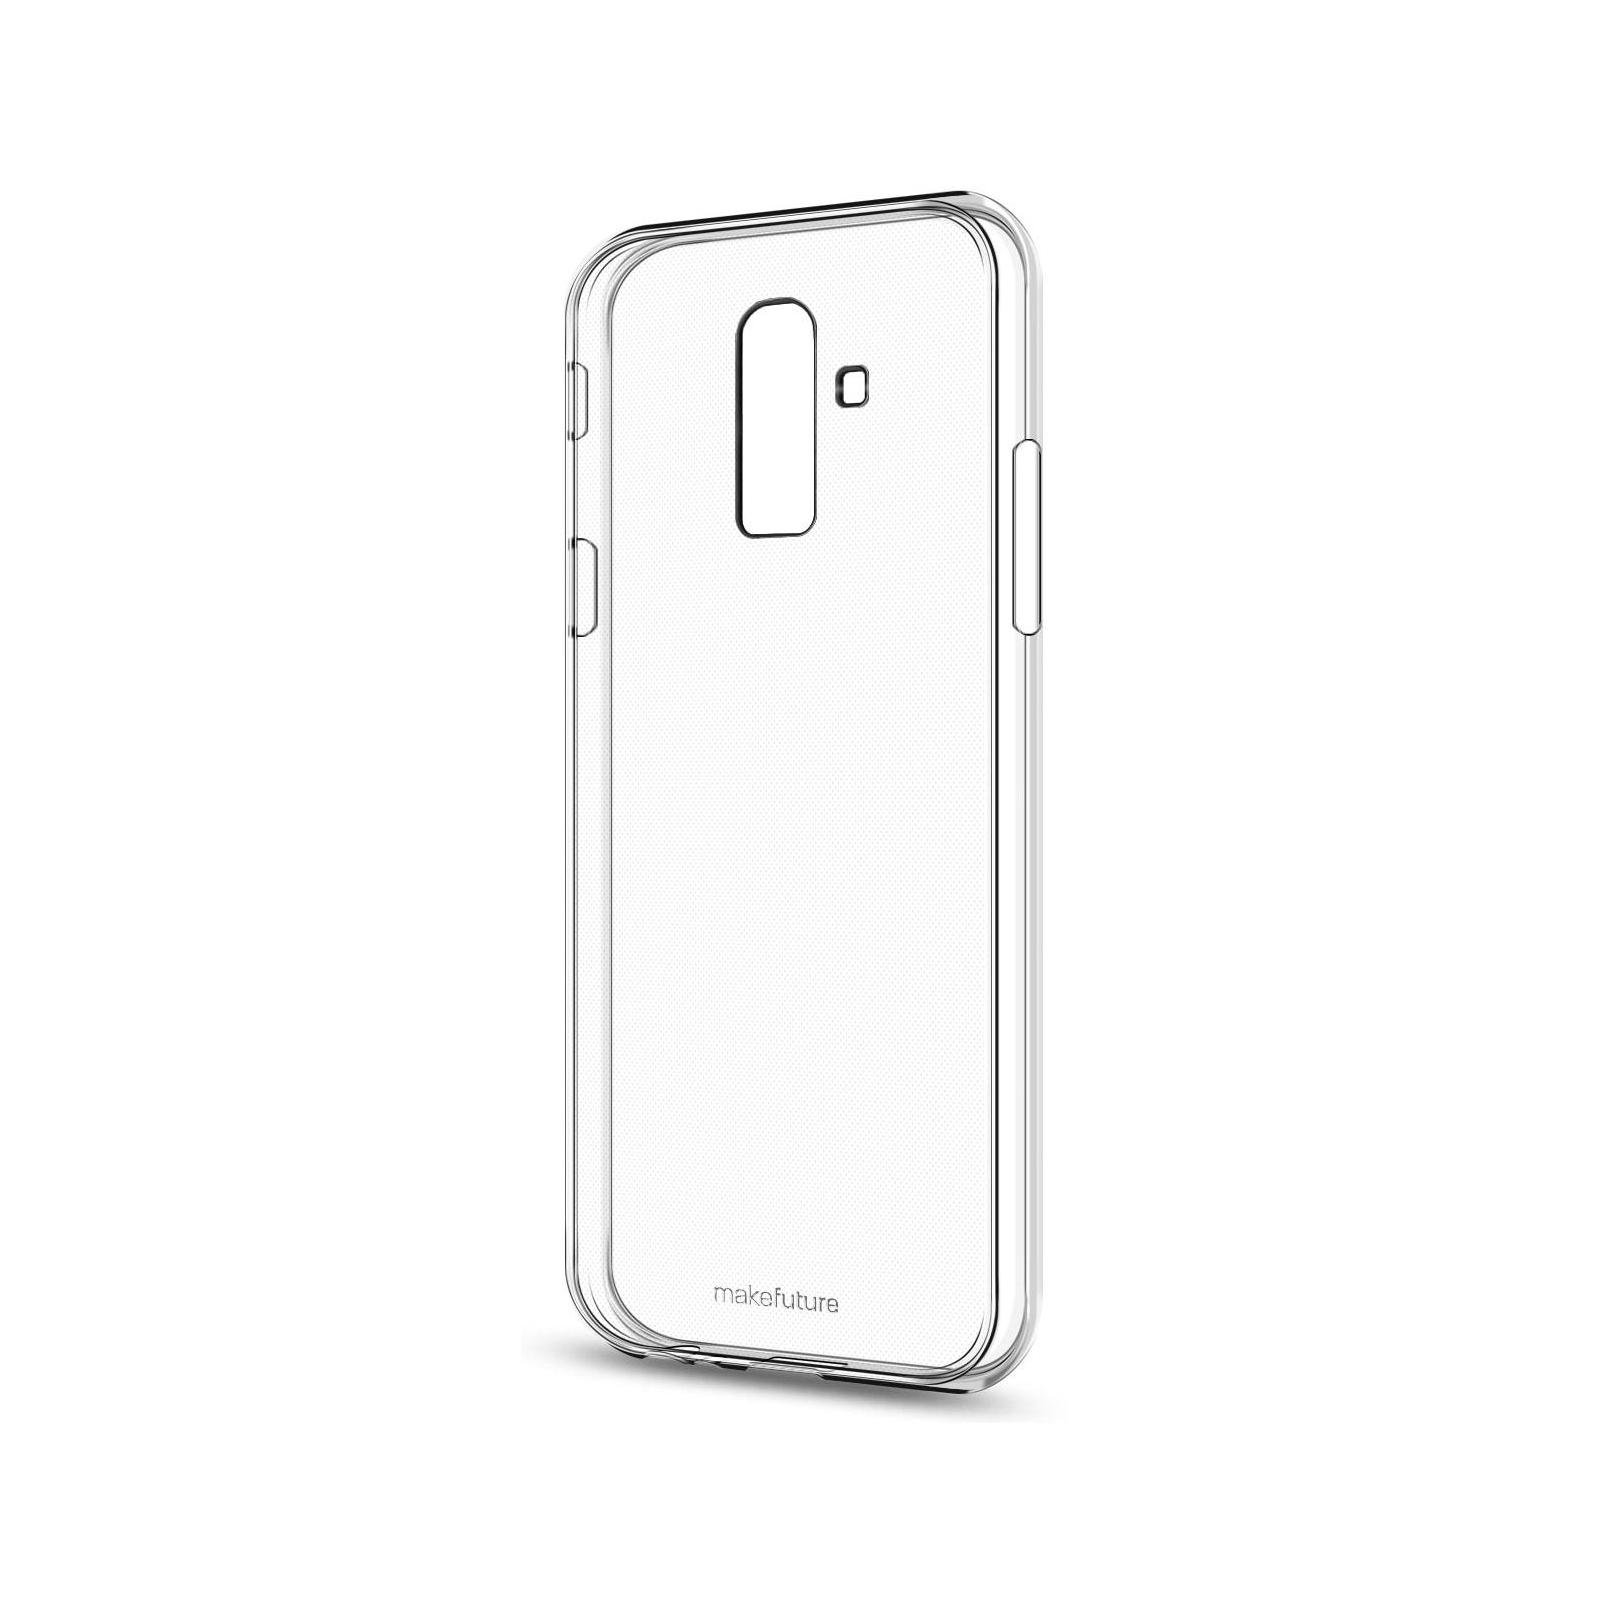 Чехол для моб. телефона MakeFuture Air Case (TPU) Samsung J8 2018 Clear (MCA-SJ818CL)